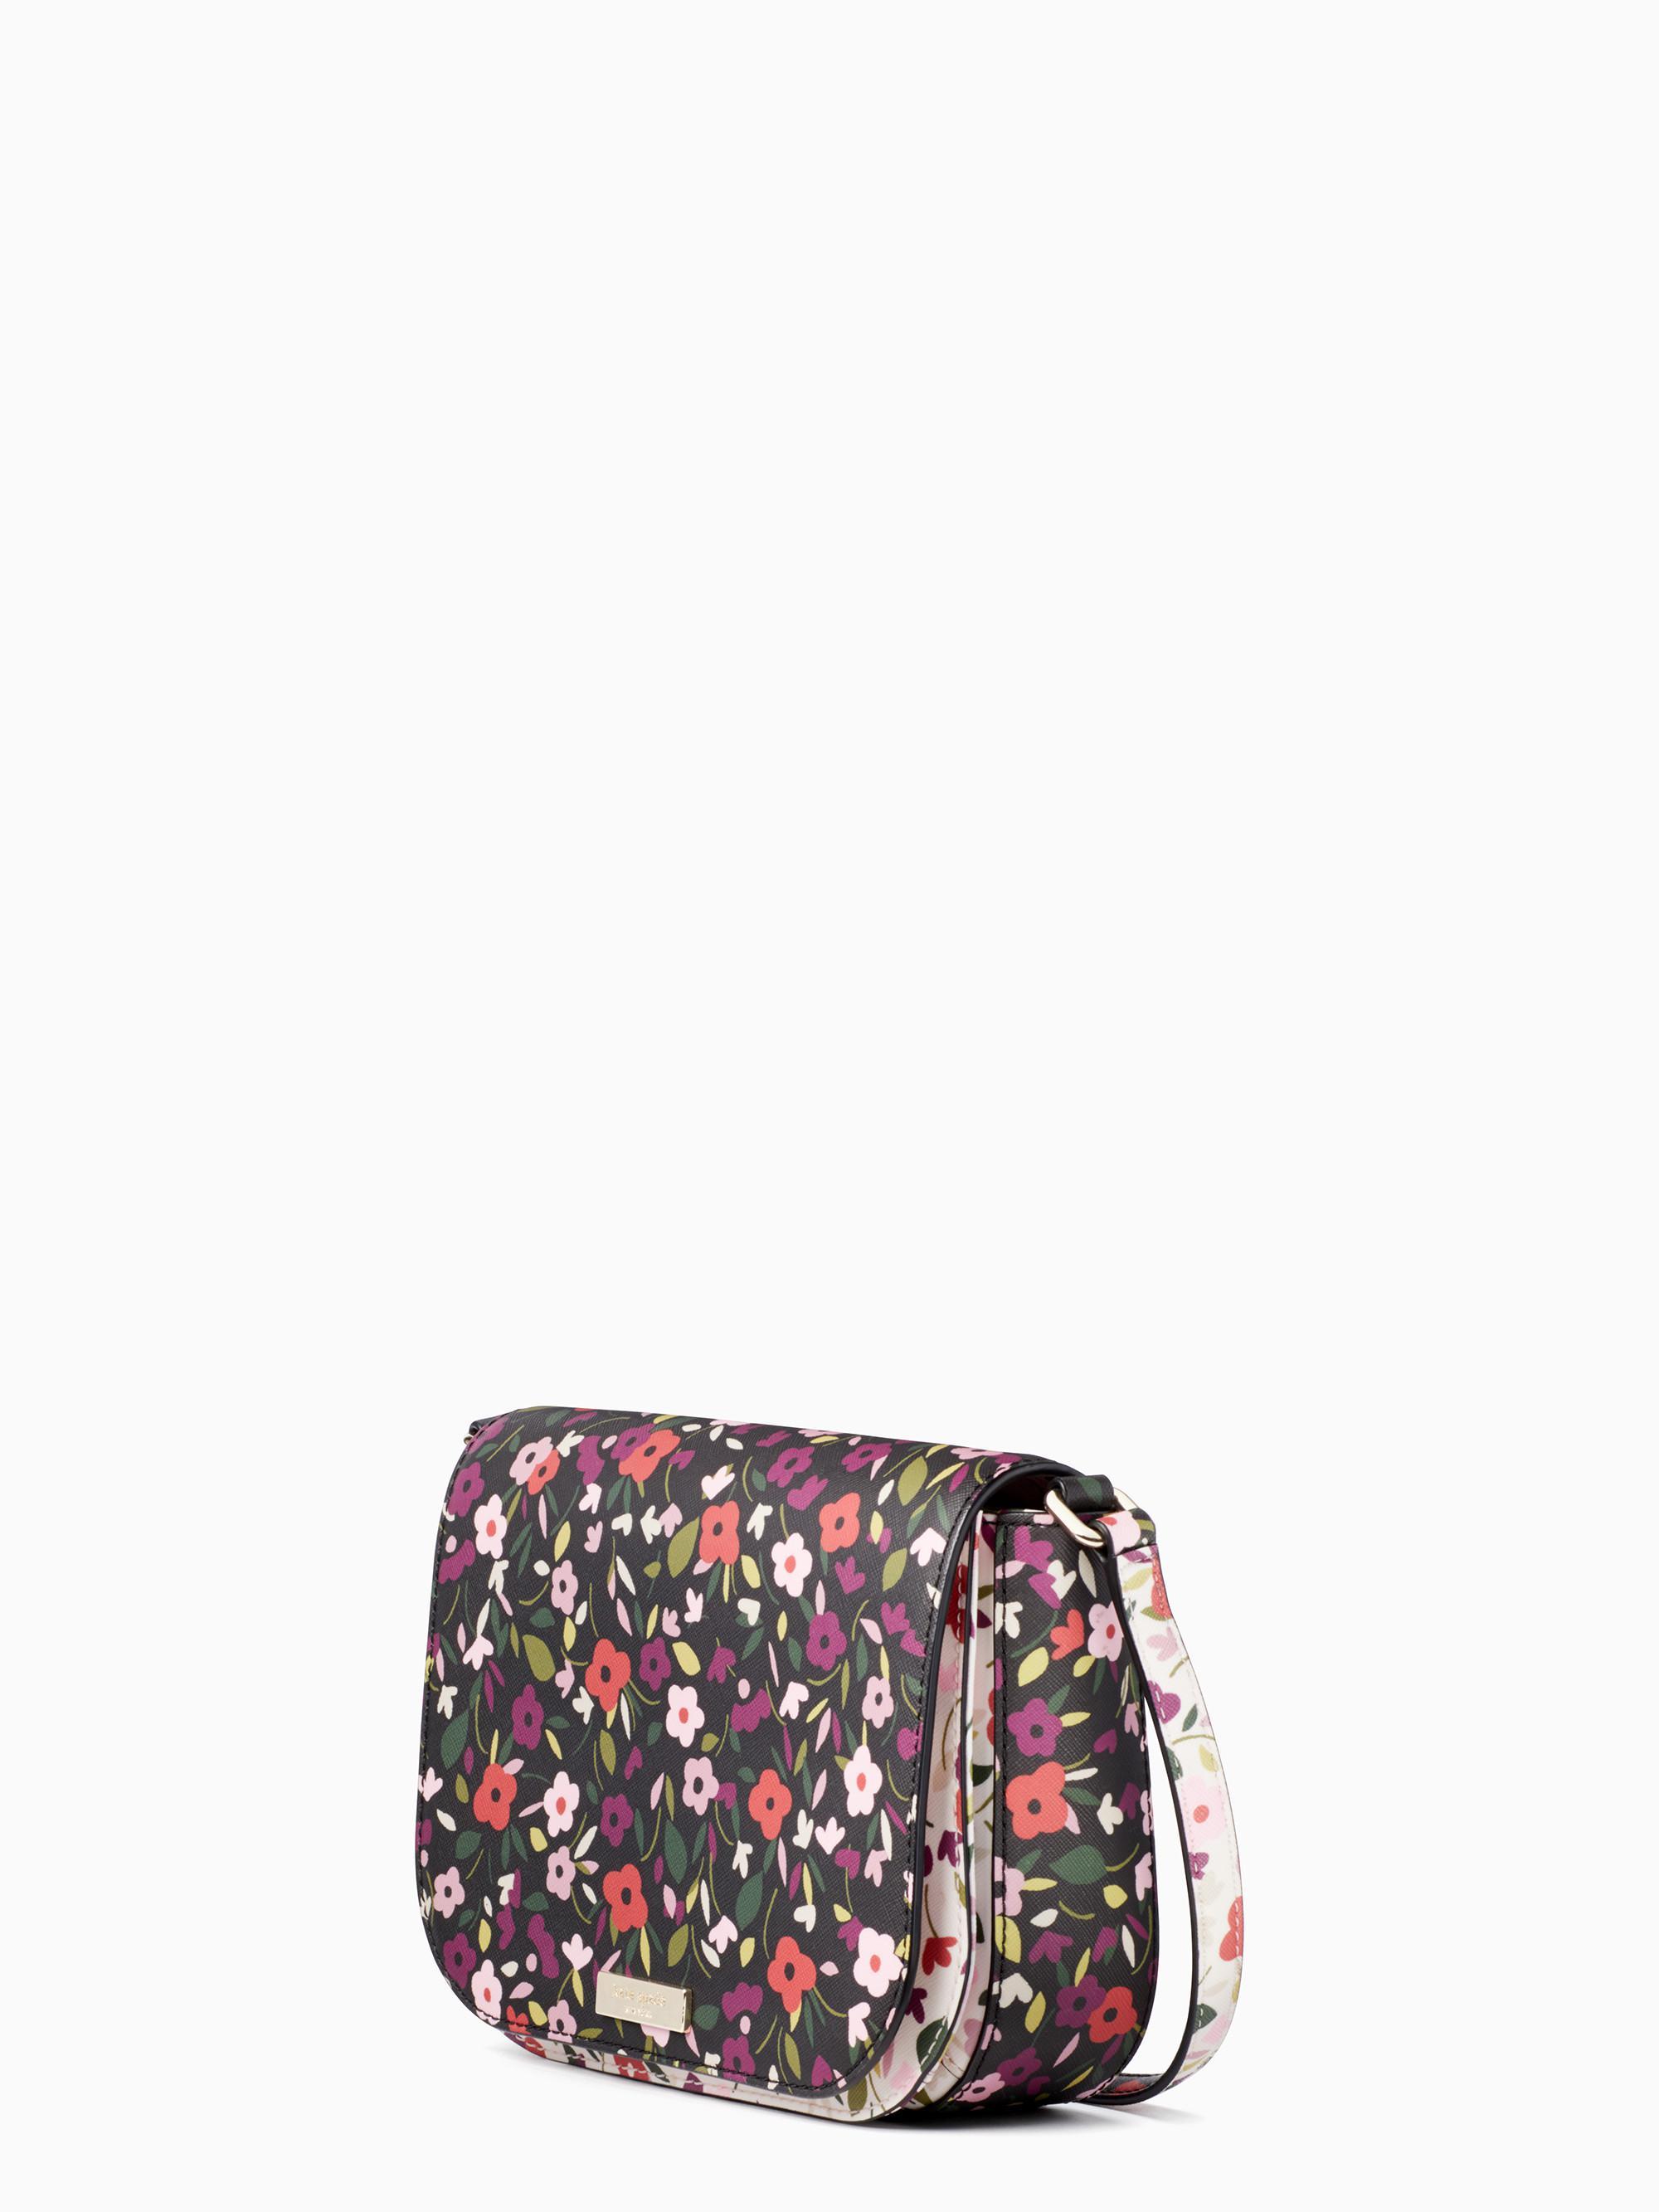 3517eb74ea78 Kate Spade Multicolor Laurel Way Boho Floral Large Carsen